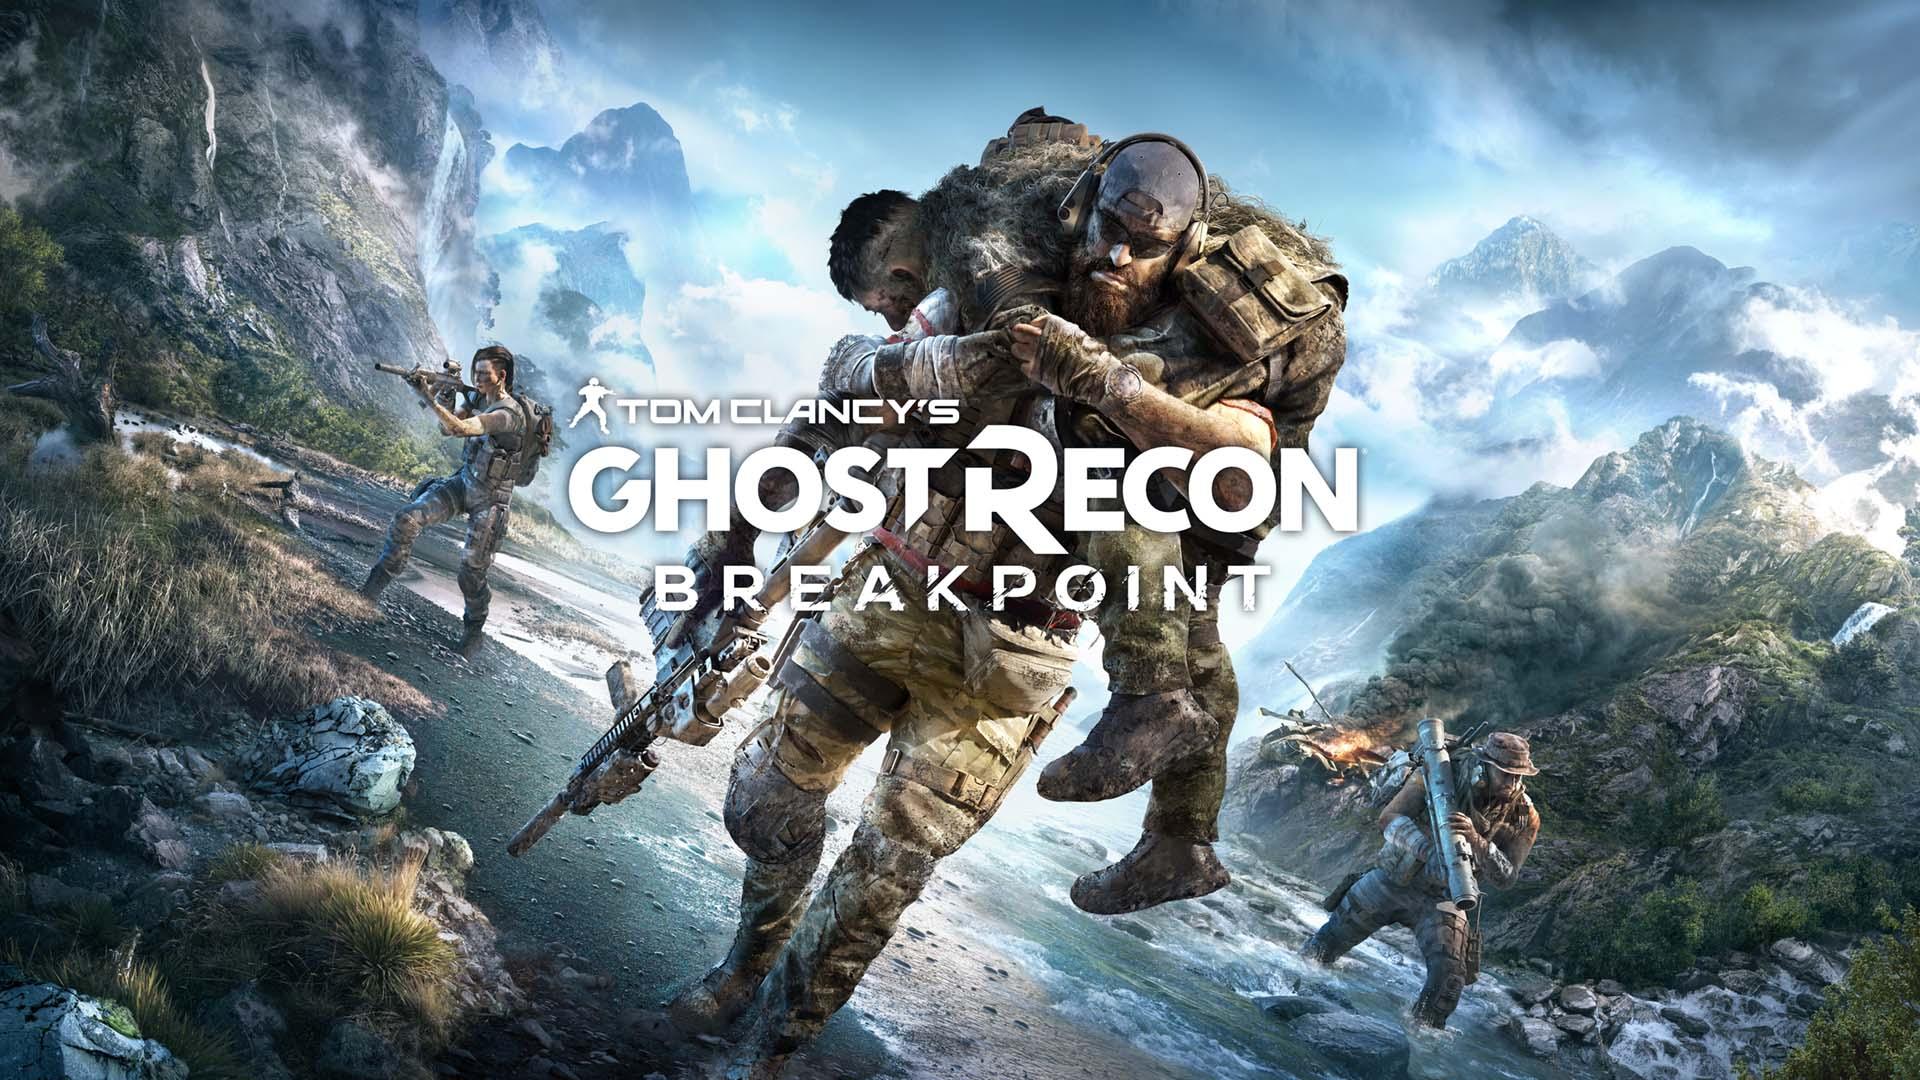 Ghost Recon Breakpoint anunciado para PC, PS4 e Xbox One